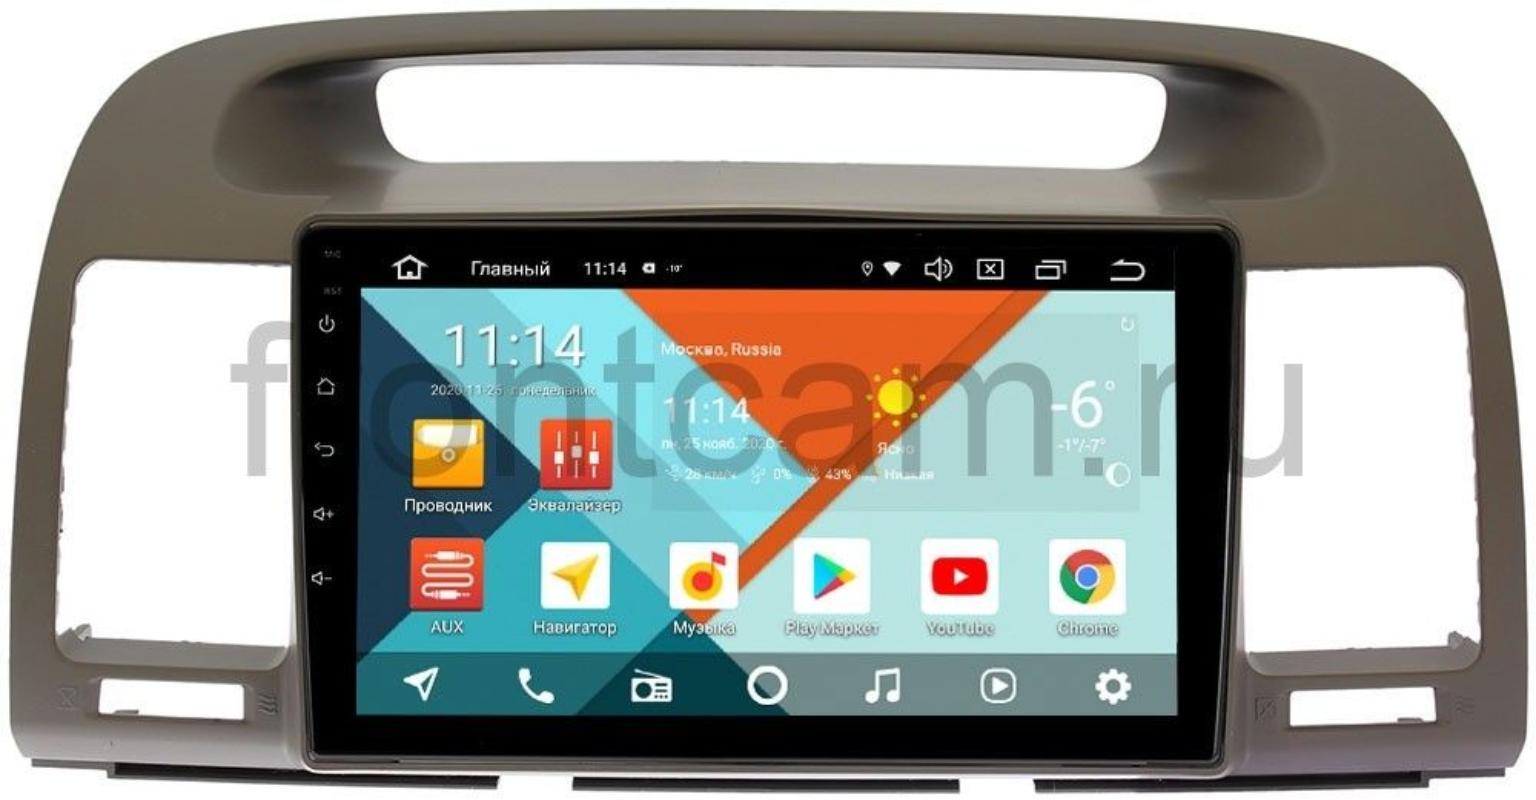 Штатная магнитола Toyota Camry V30 2001-2006 Wide Media KS9105QM-2/32 DSP CarPlay 4G-SIM Android 10 (+ Камера заднего вида в подарок!)